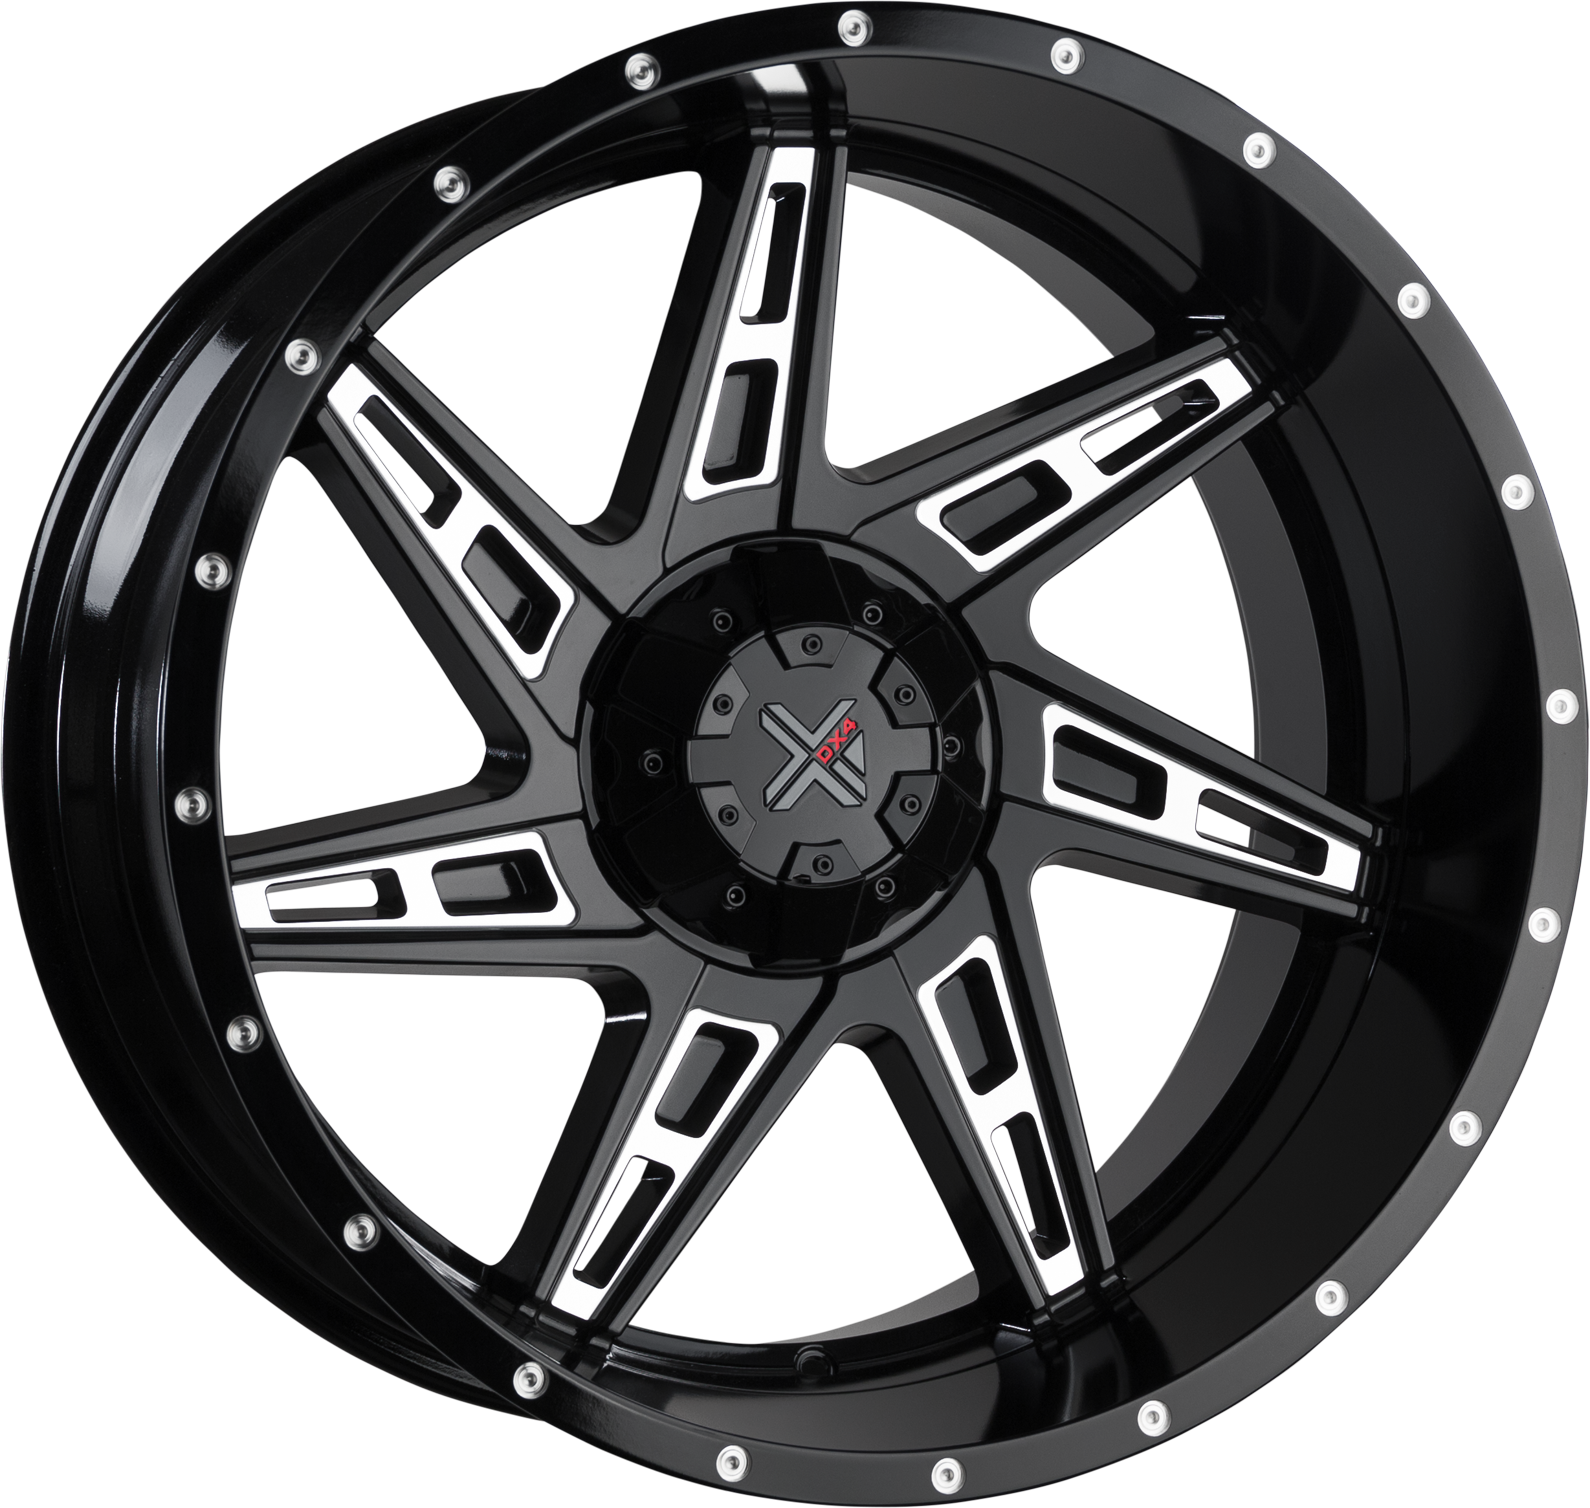 DX4 SKULL - Gloss Black Machined